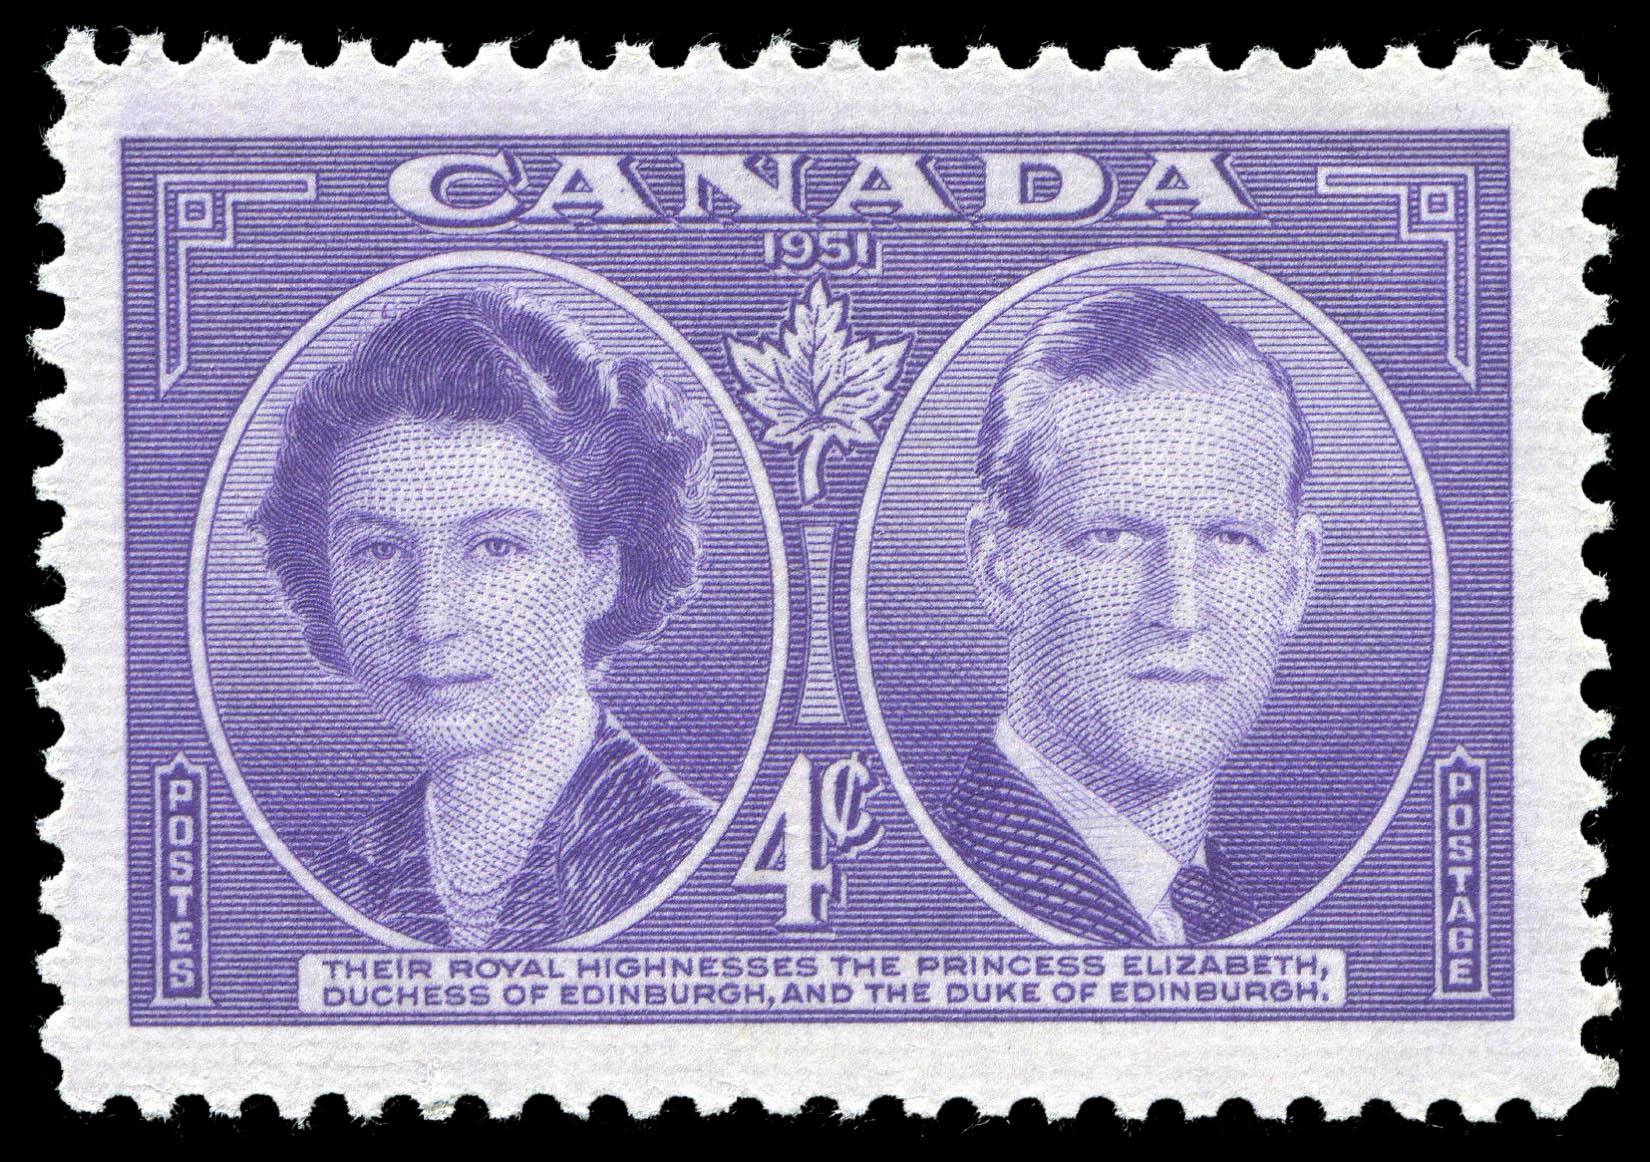 Their Royal Highnesses the Princess Elizabeth, Duchess of Edinburgh, and the Duke of Edinburgh Canada Postage Stamp